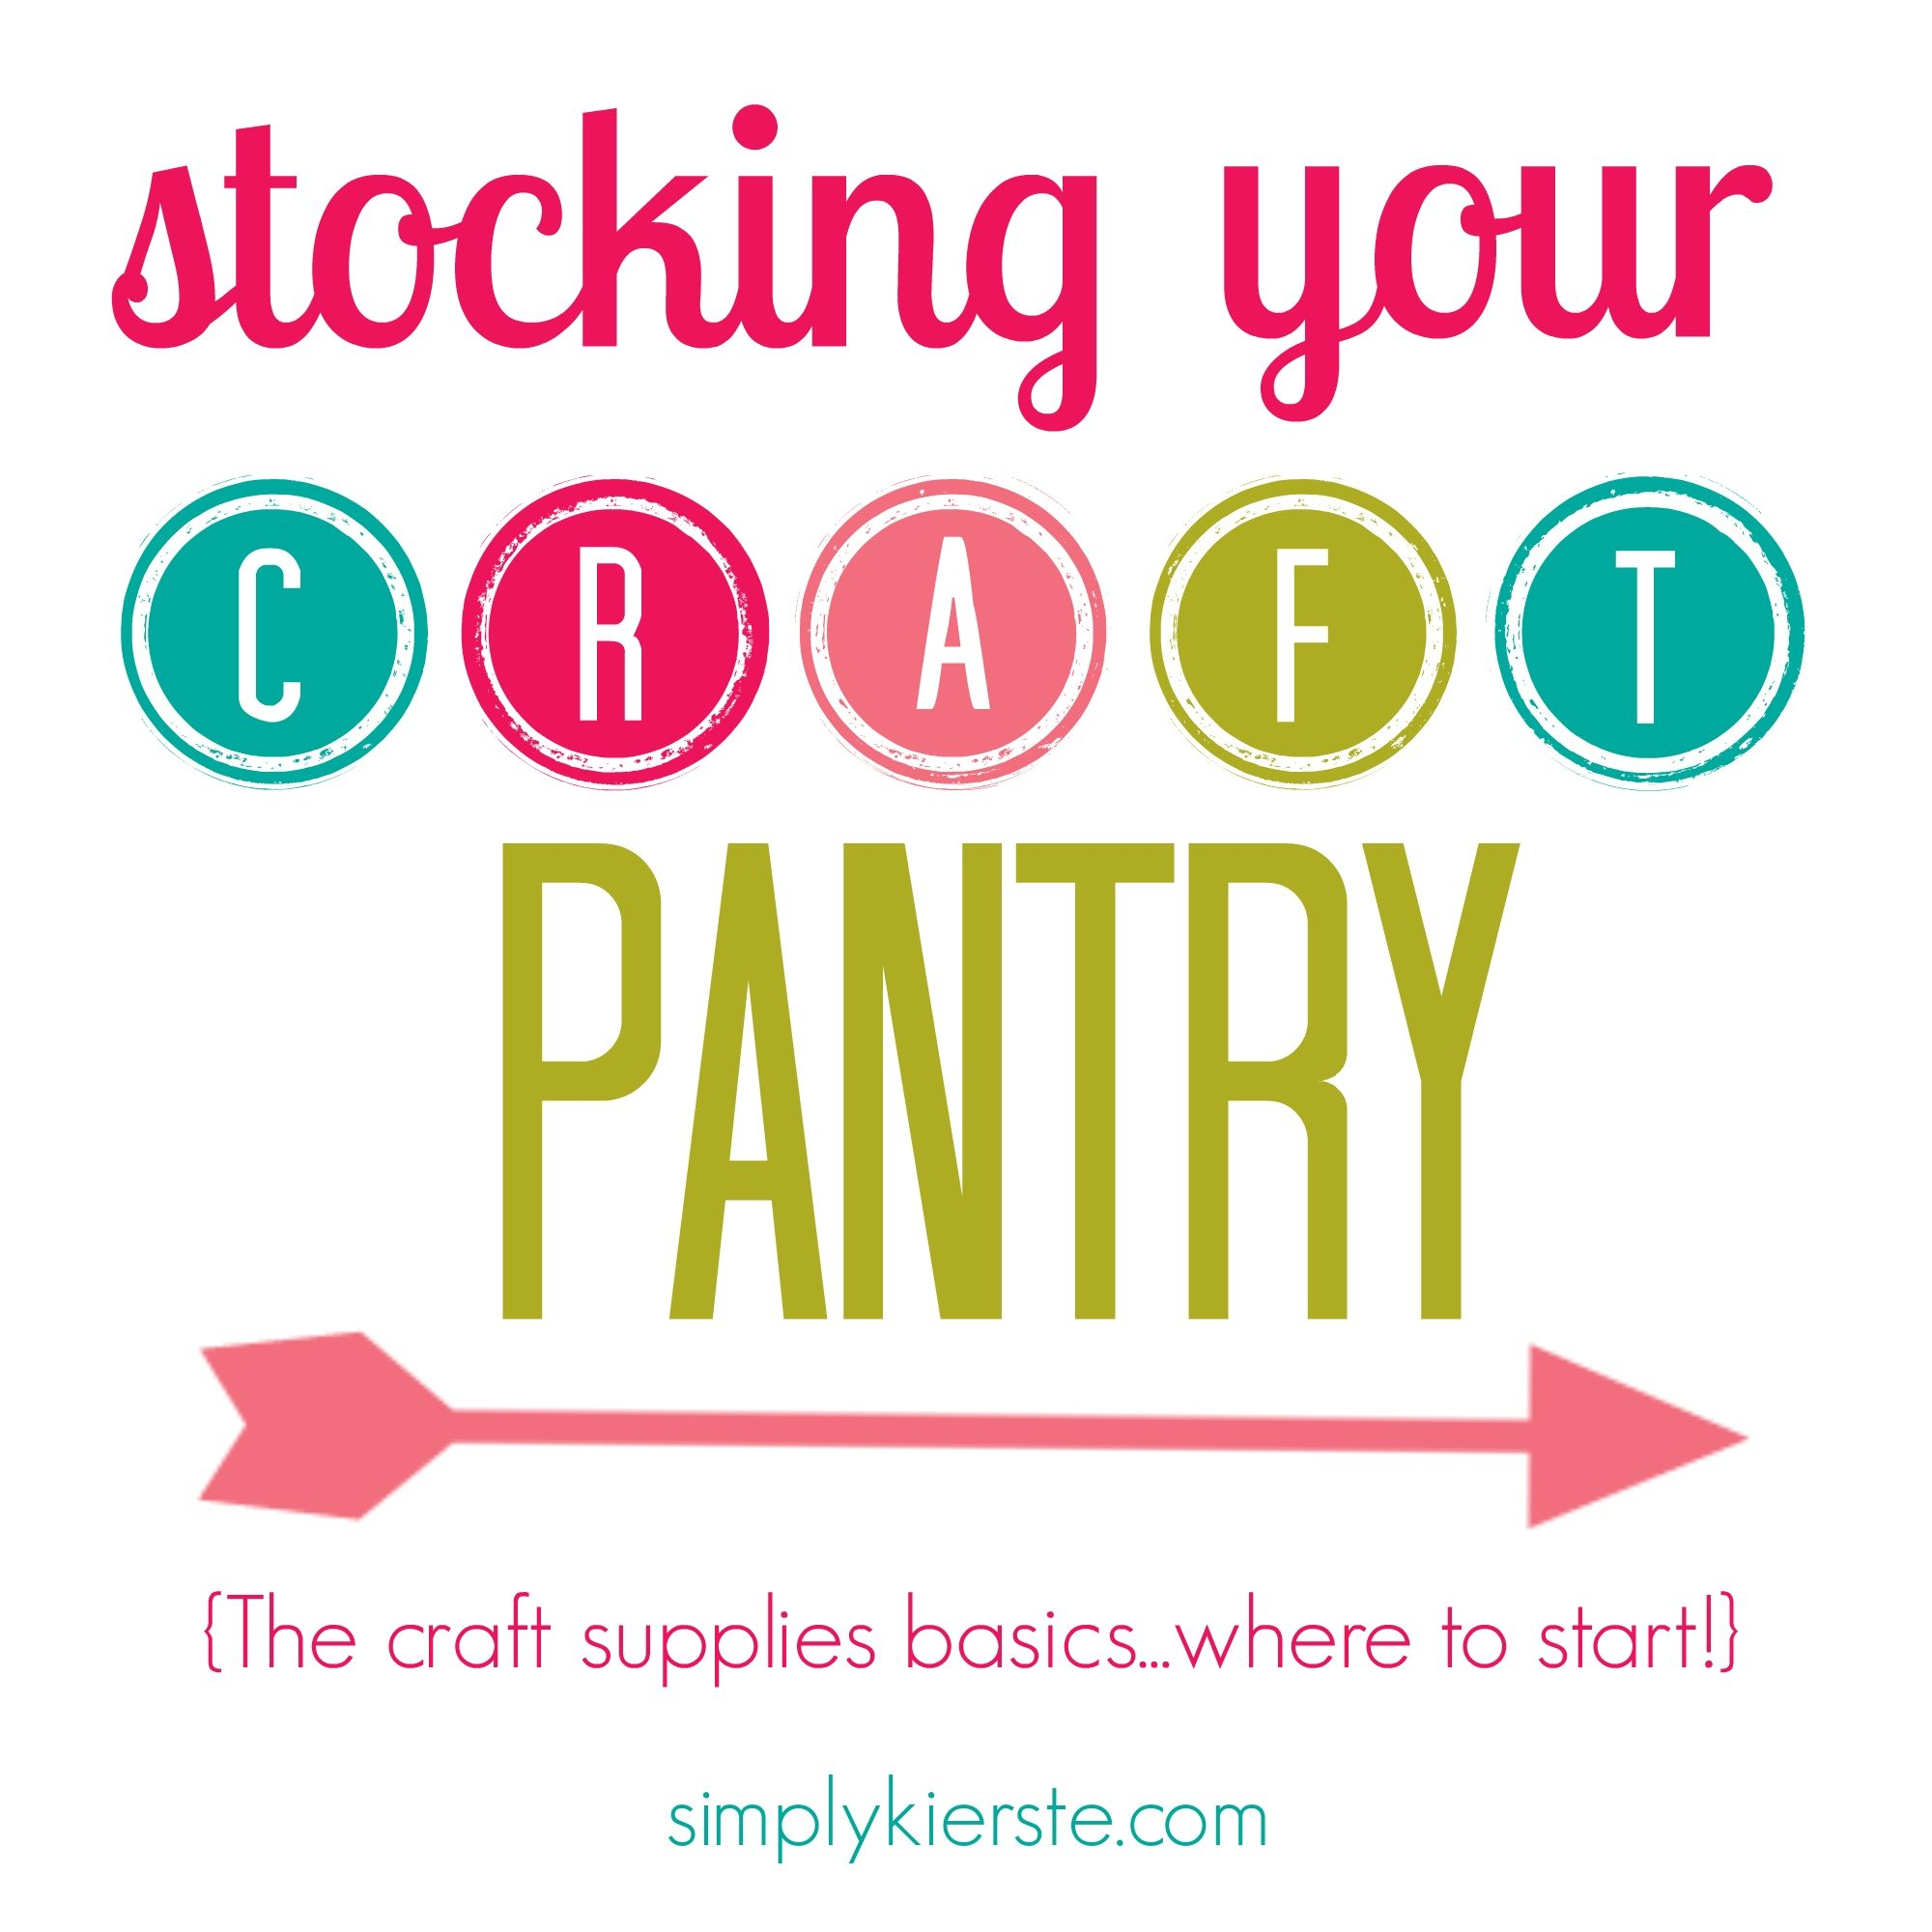 Stocking your craft pantry!